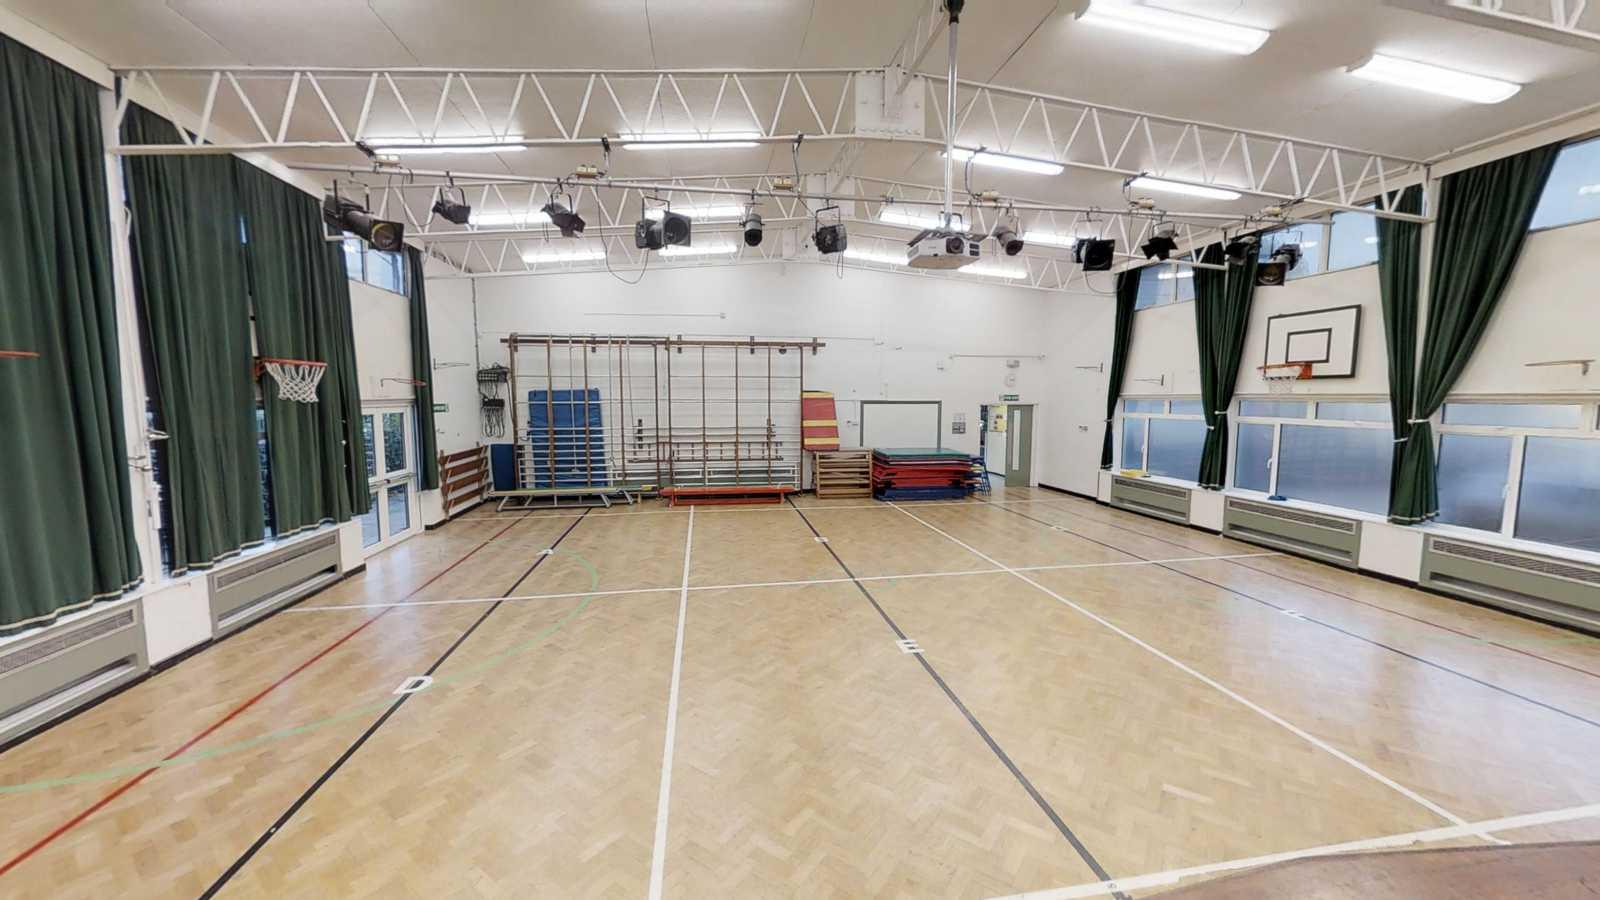 Sporting hall